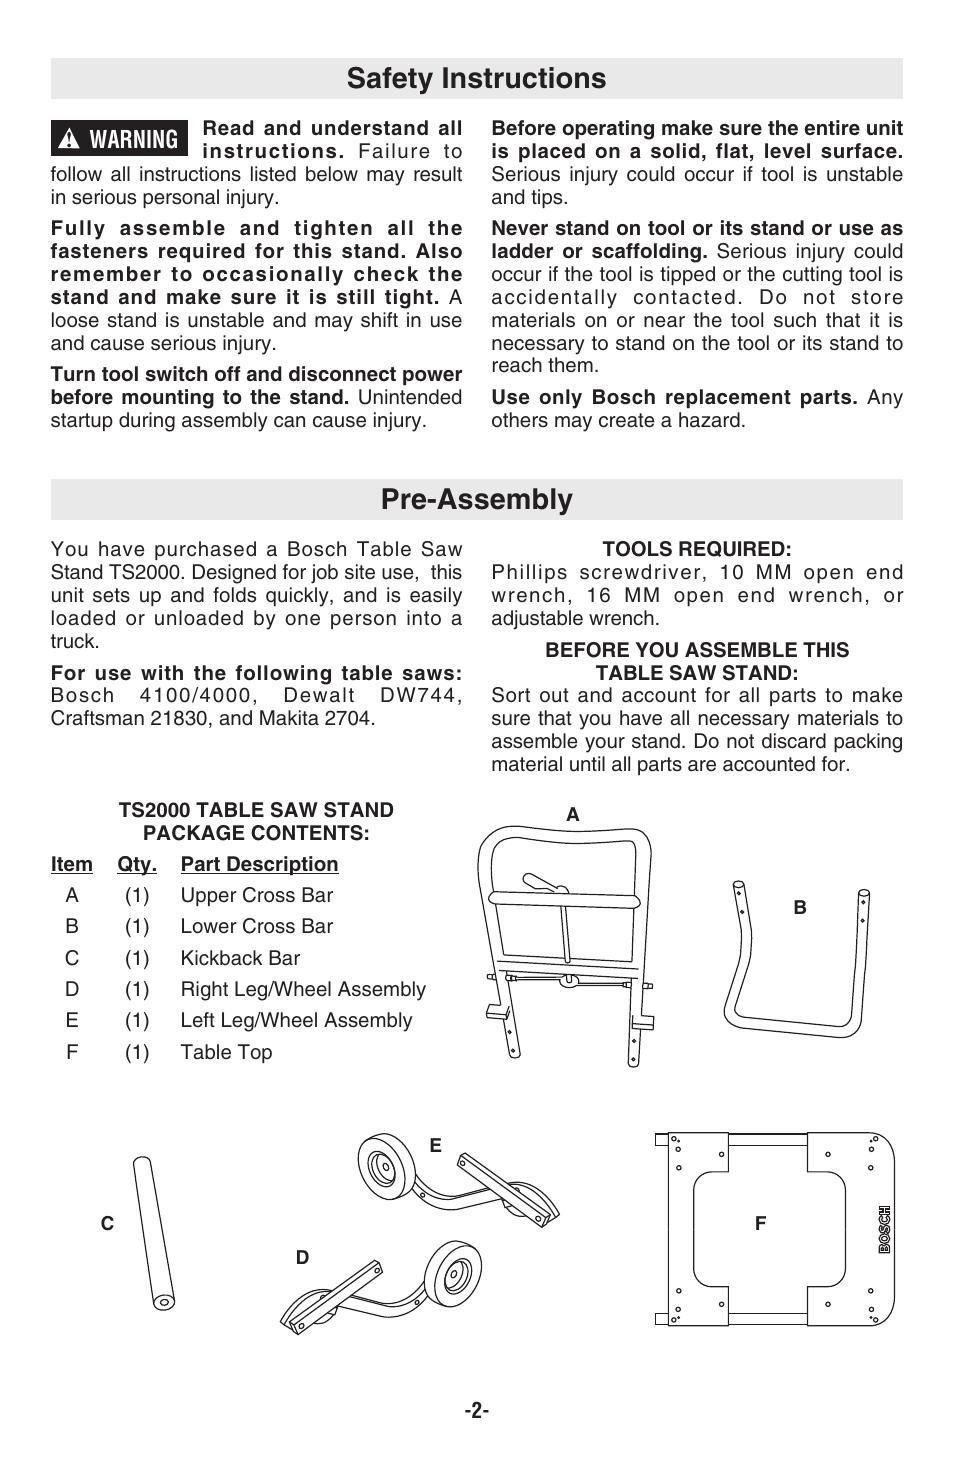 Pre-assembly safety instructions, Warning | Bosch TS2000